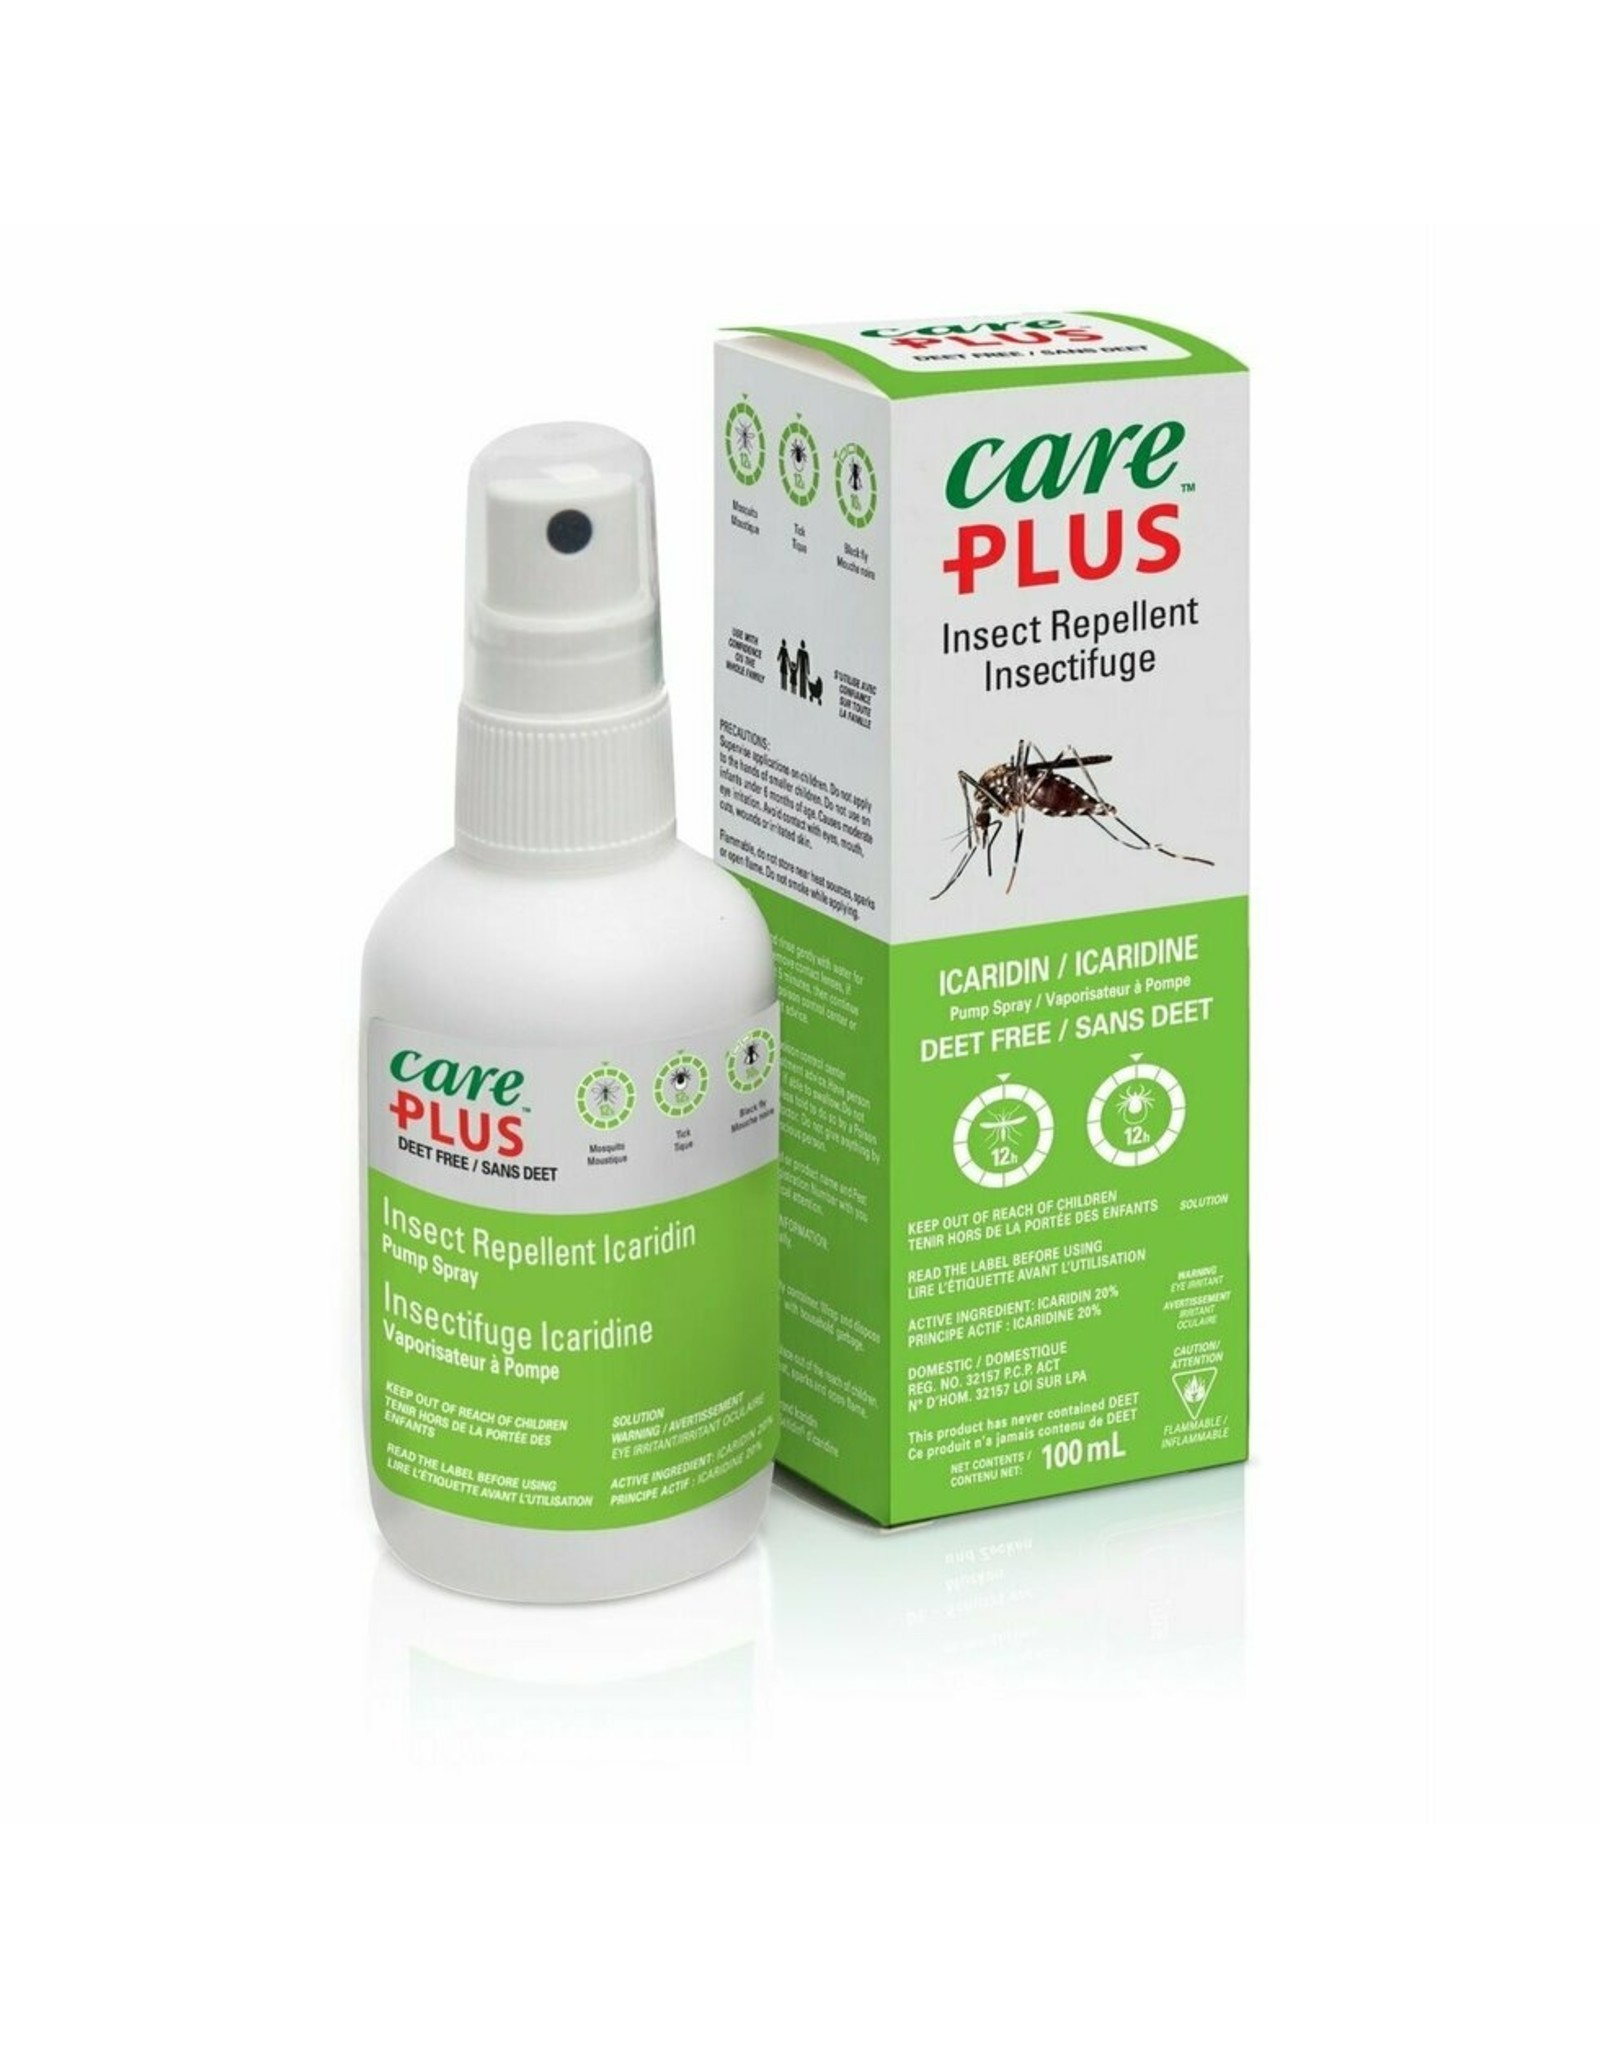 Care Plus Care Plus Insect Repellent 20% 100ml